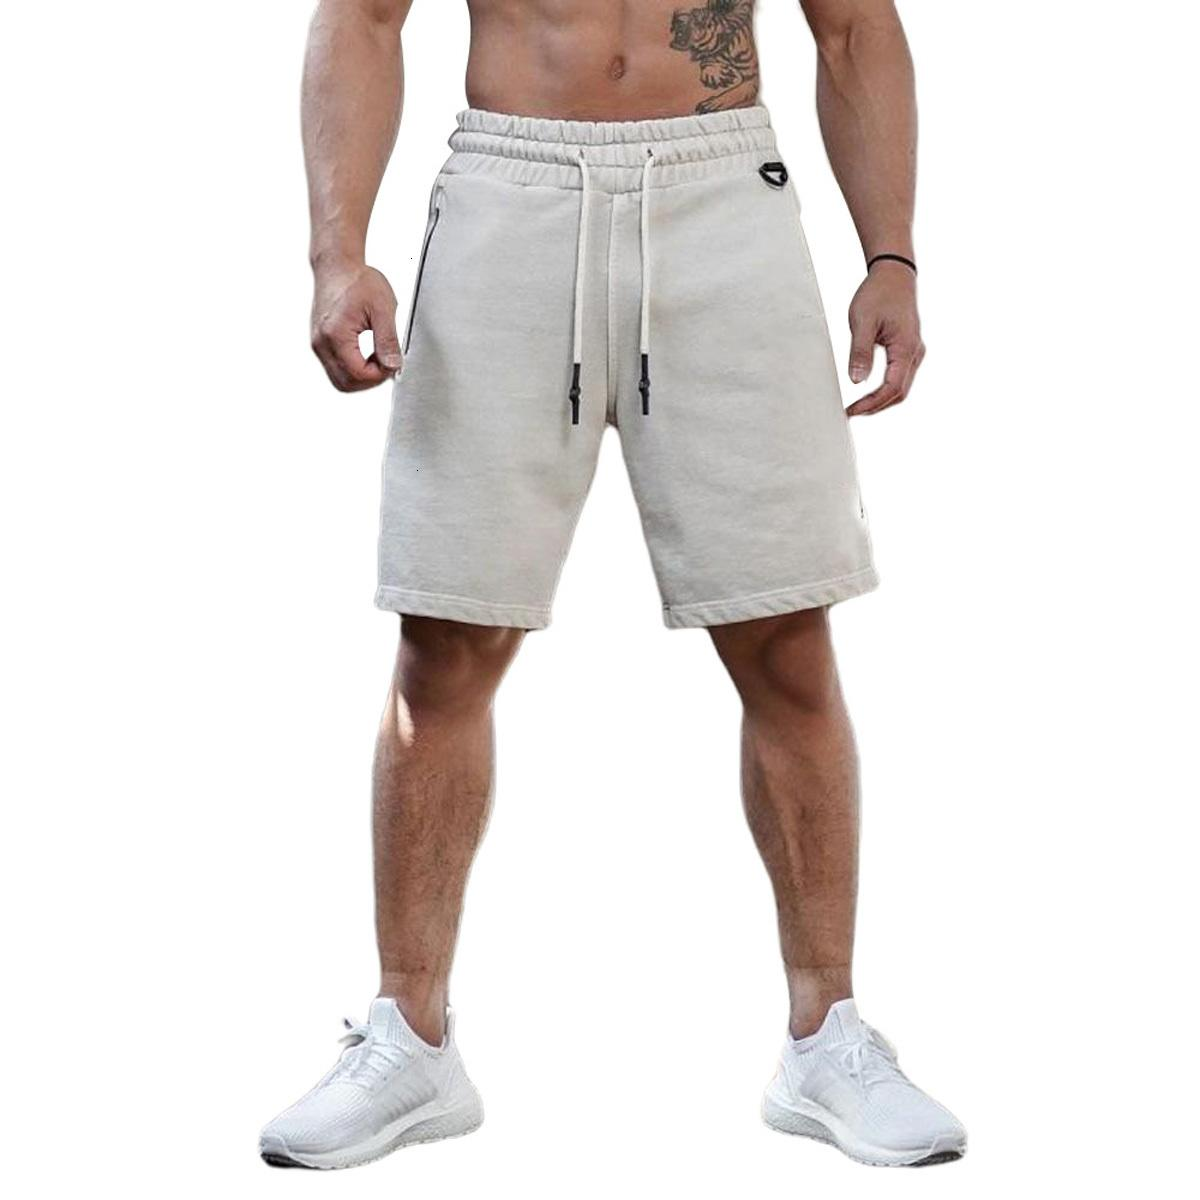 Hombres Casual Effens Color Running Cat Mode Fitness Practice Enterrout Summer Jogging Pantalones Entrenamiento Shorts0yk20yk2